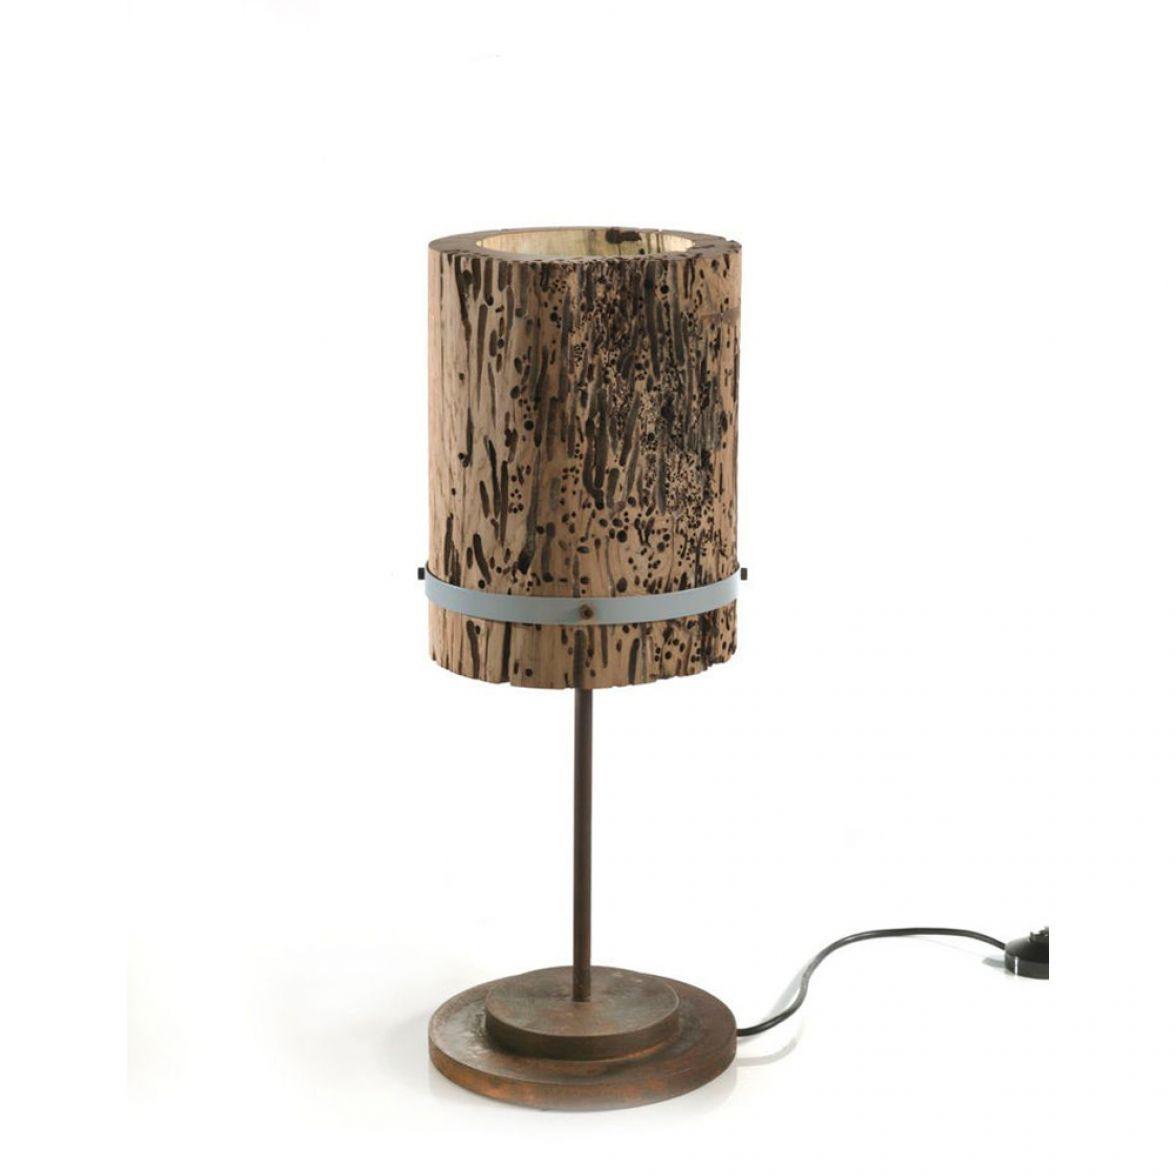 Brico light Borin table lamp